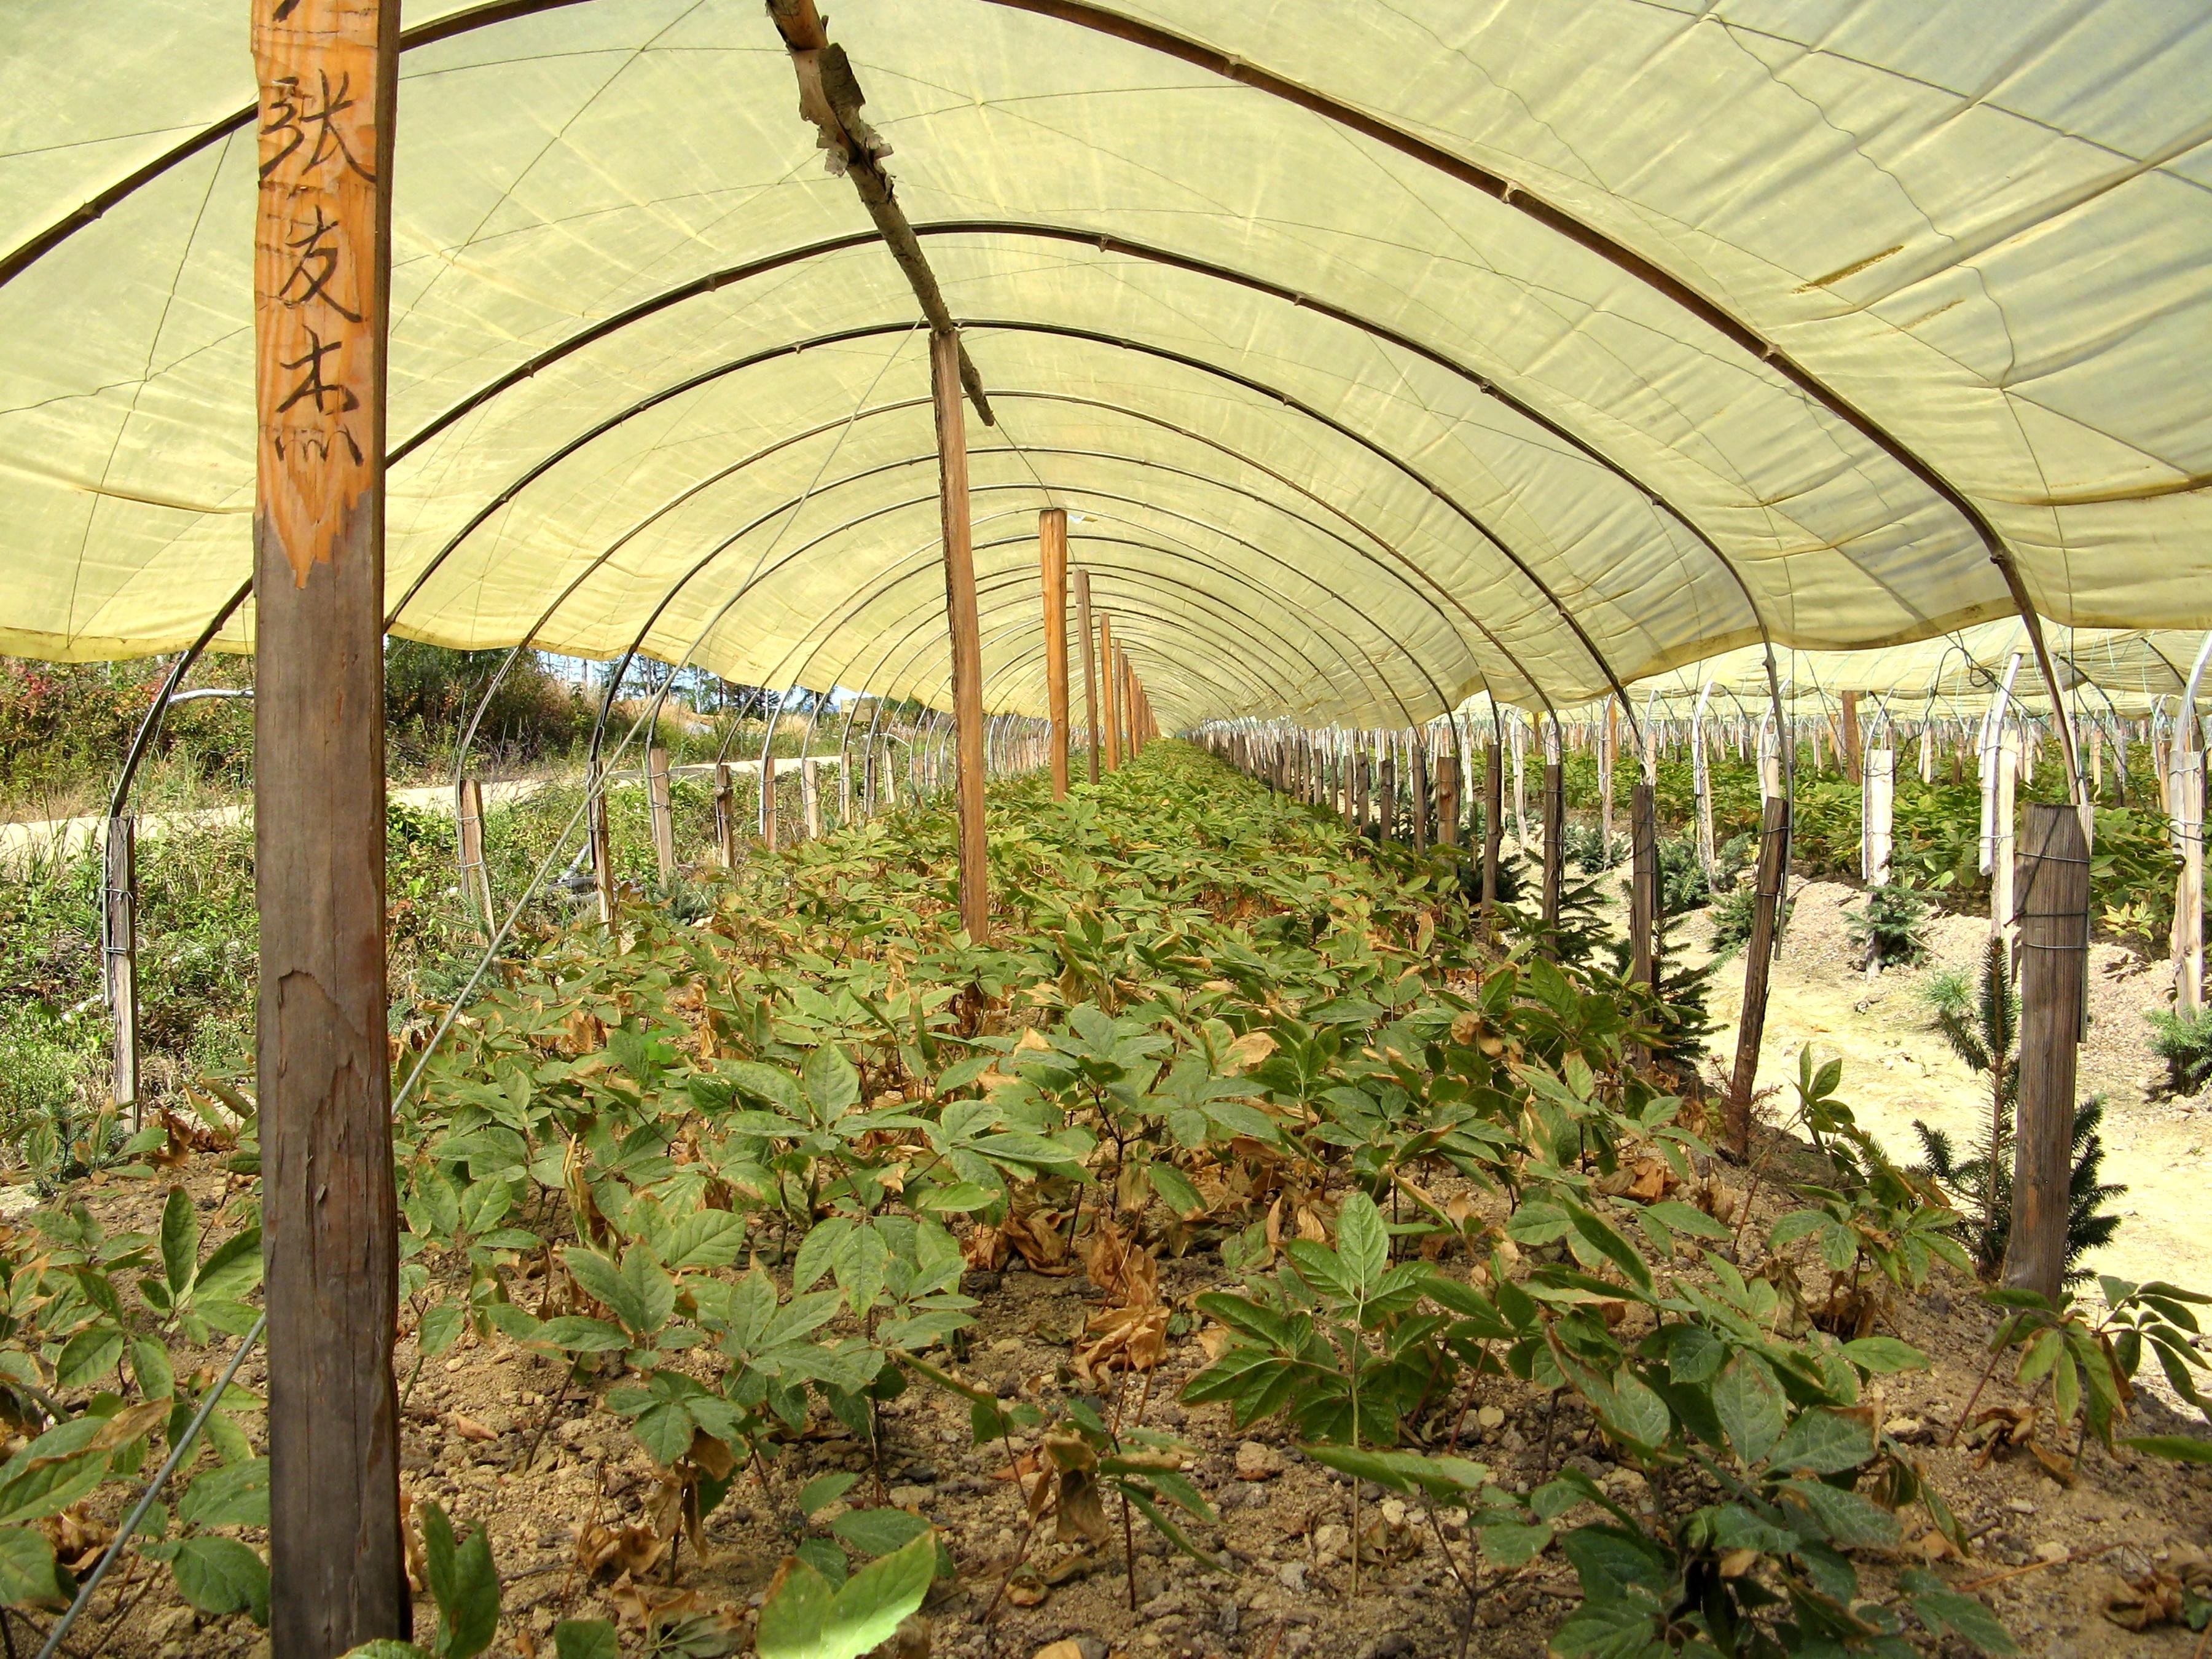 Panax ginseng plants in hoop house Jilin Provence China